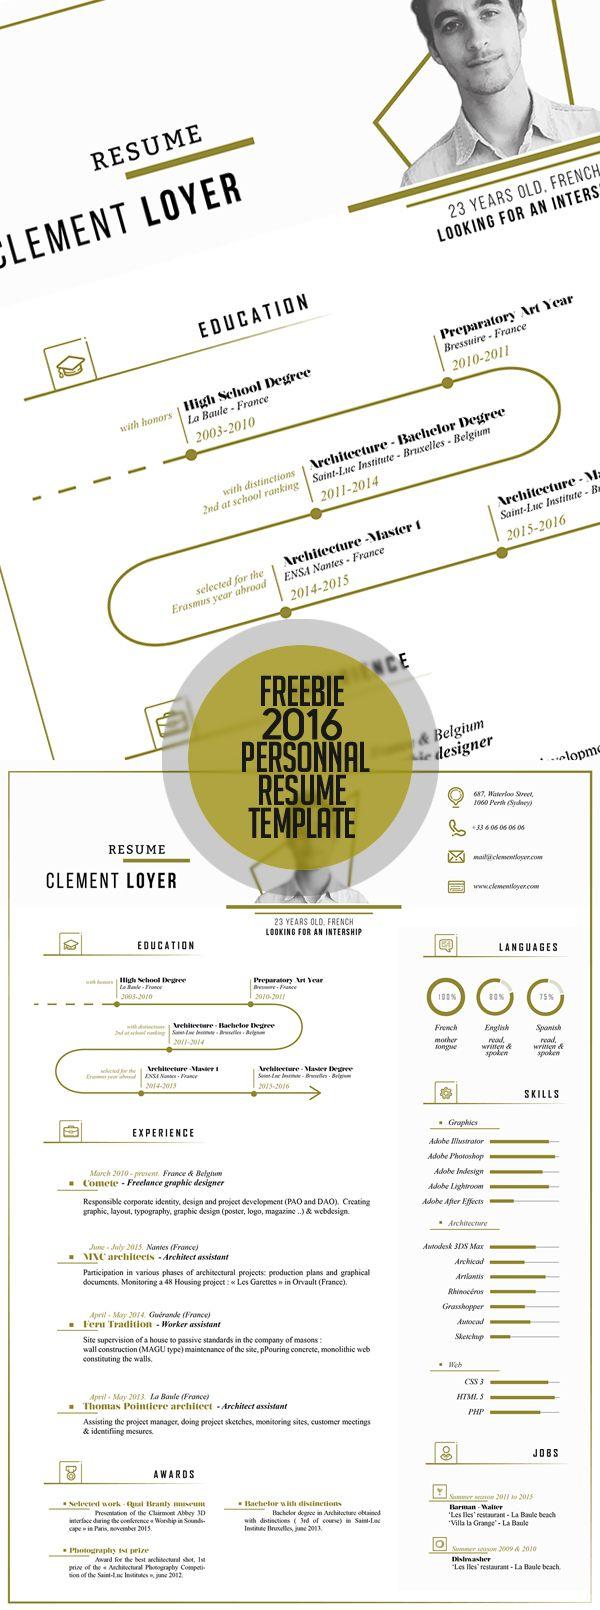 Free Fresh 2016 Resume Template | Diseño Gráfico | Pinterest ...